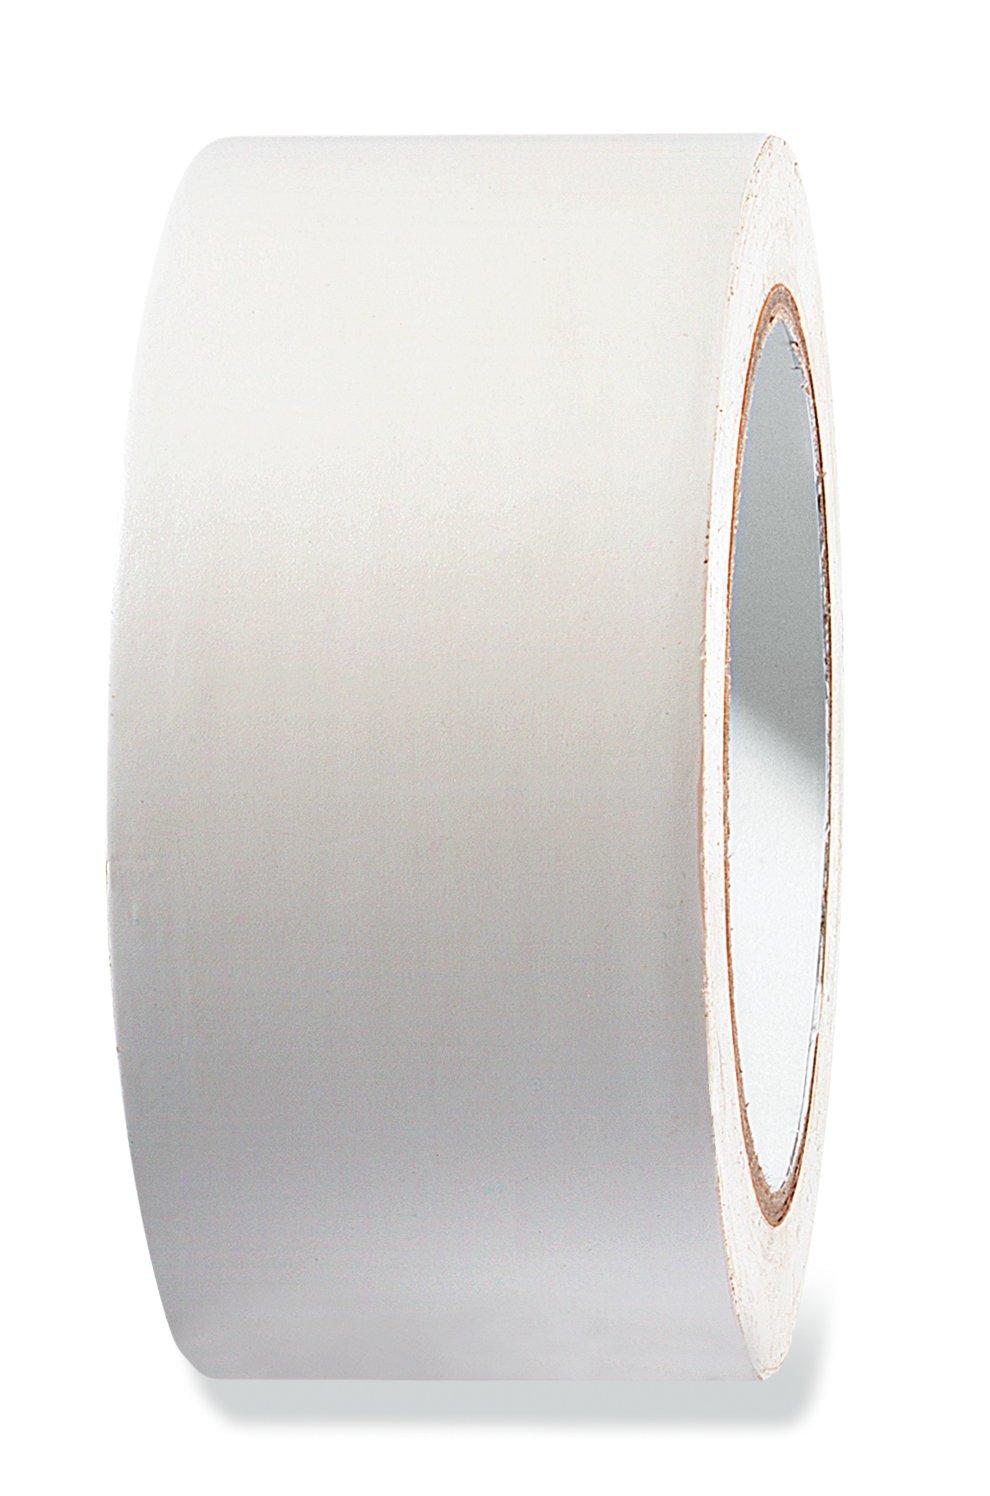 3 x PVC Schutzband glatt 50 mm PROFI Putzband 33 m weiss Putzerband ...